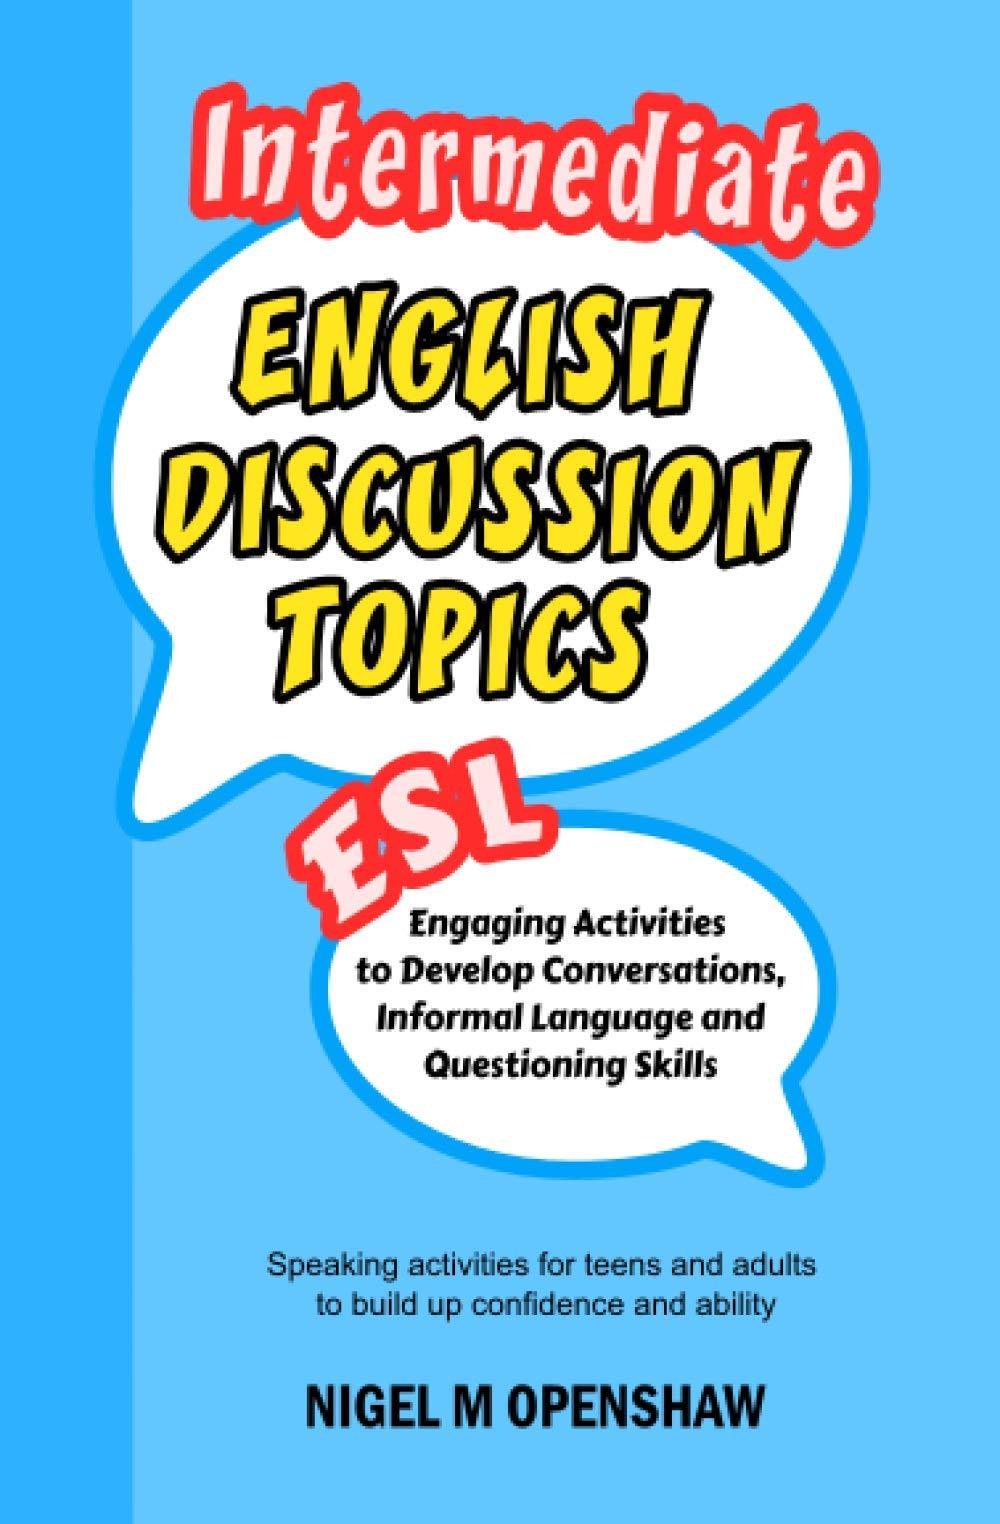 Speaking topics esl